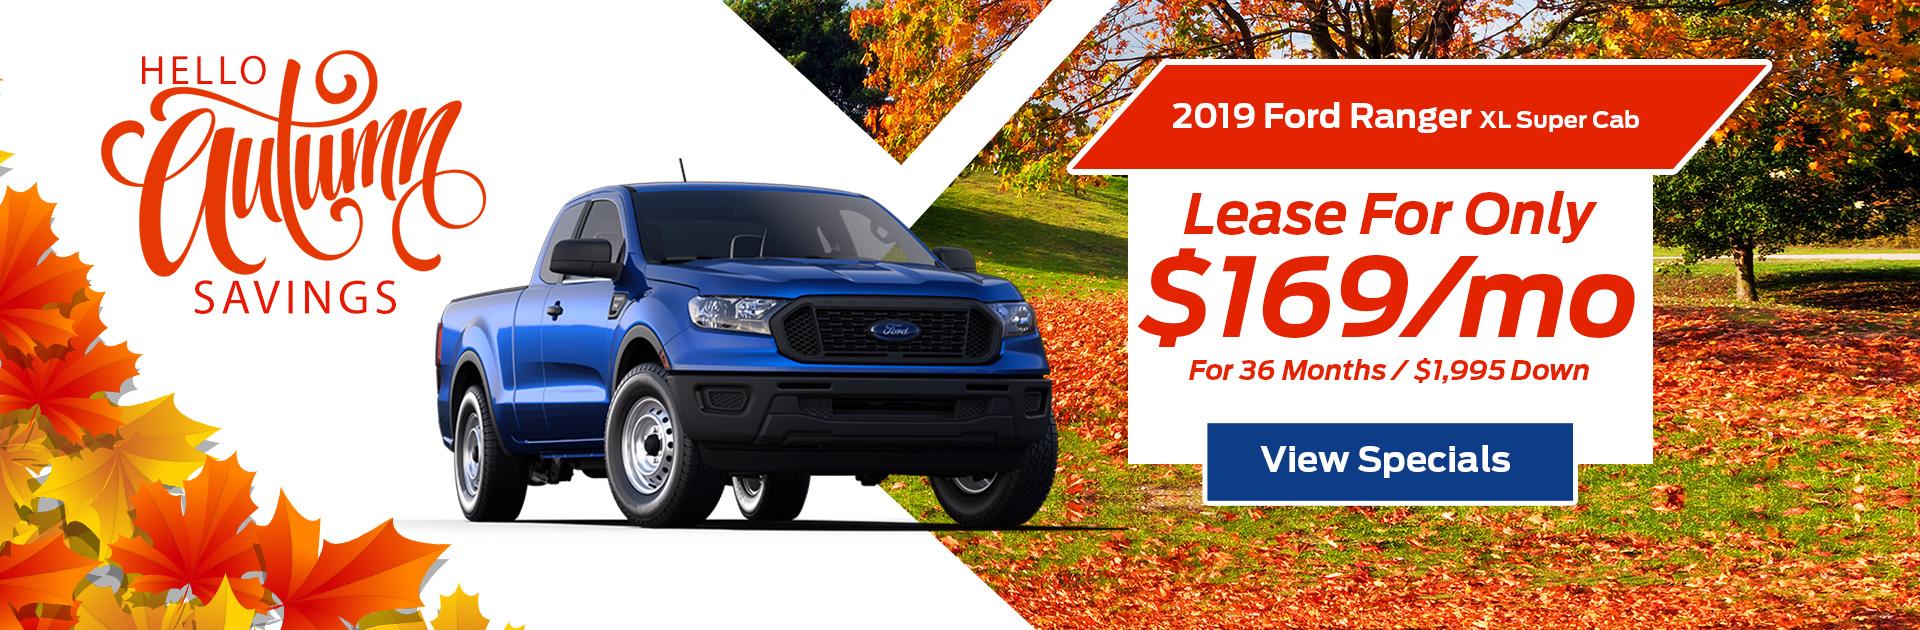 Ron DuPratt Ford | CA Ford Sales | Ford Dealership in Dixon, CA